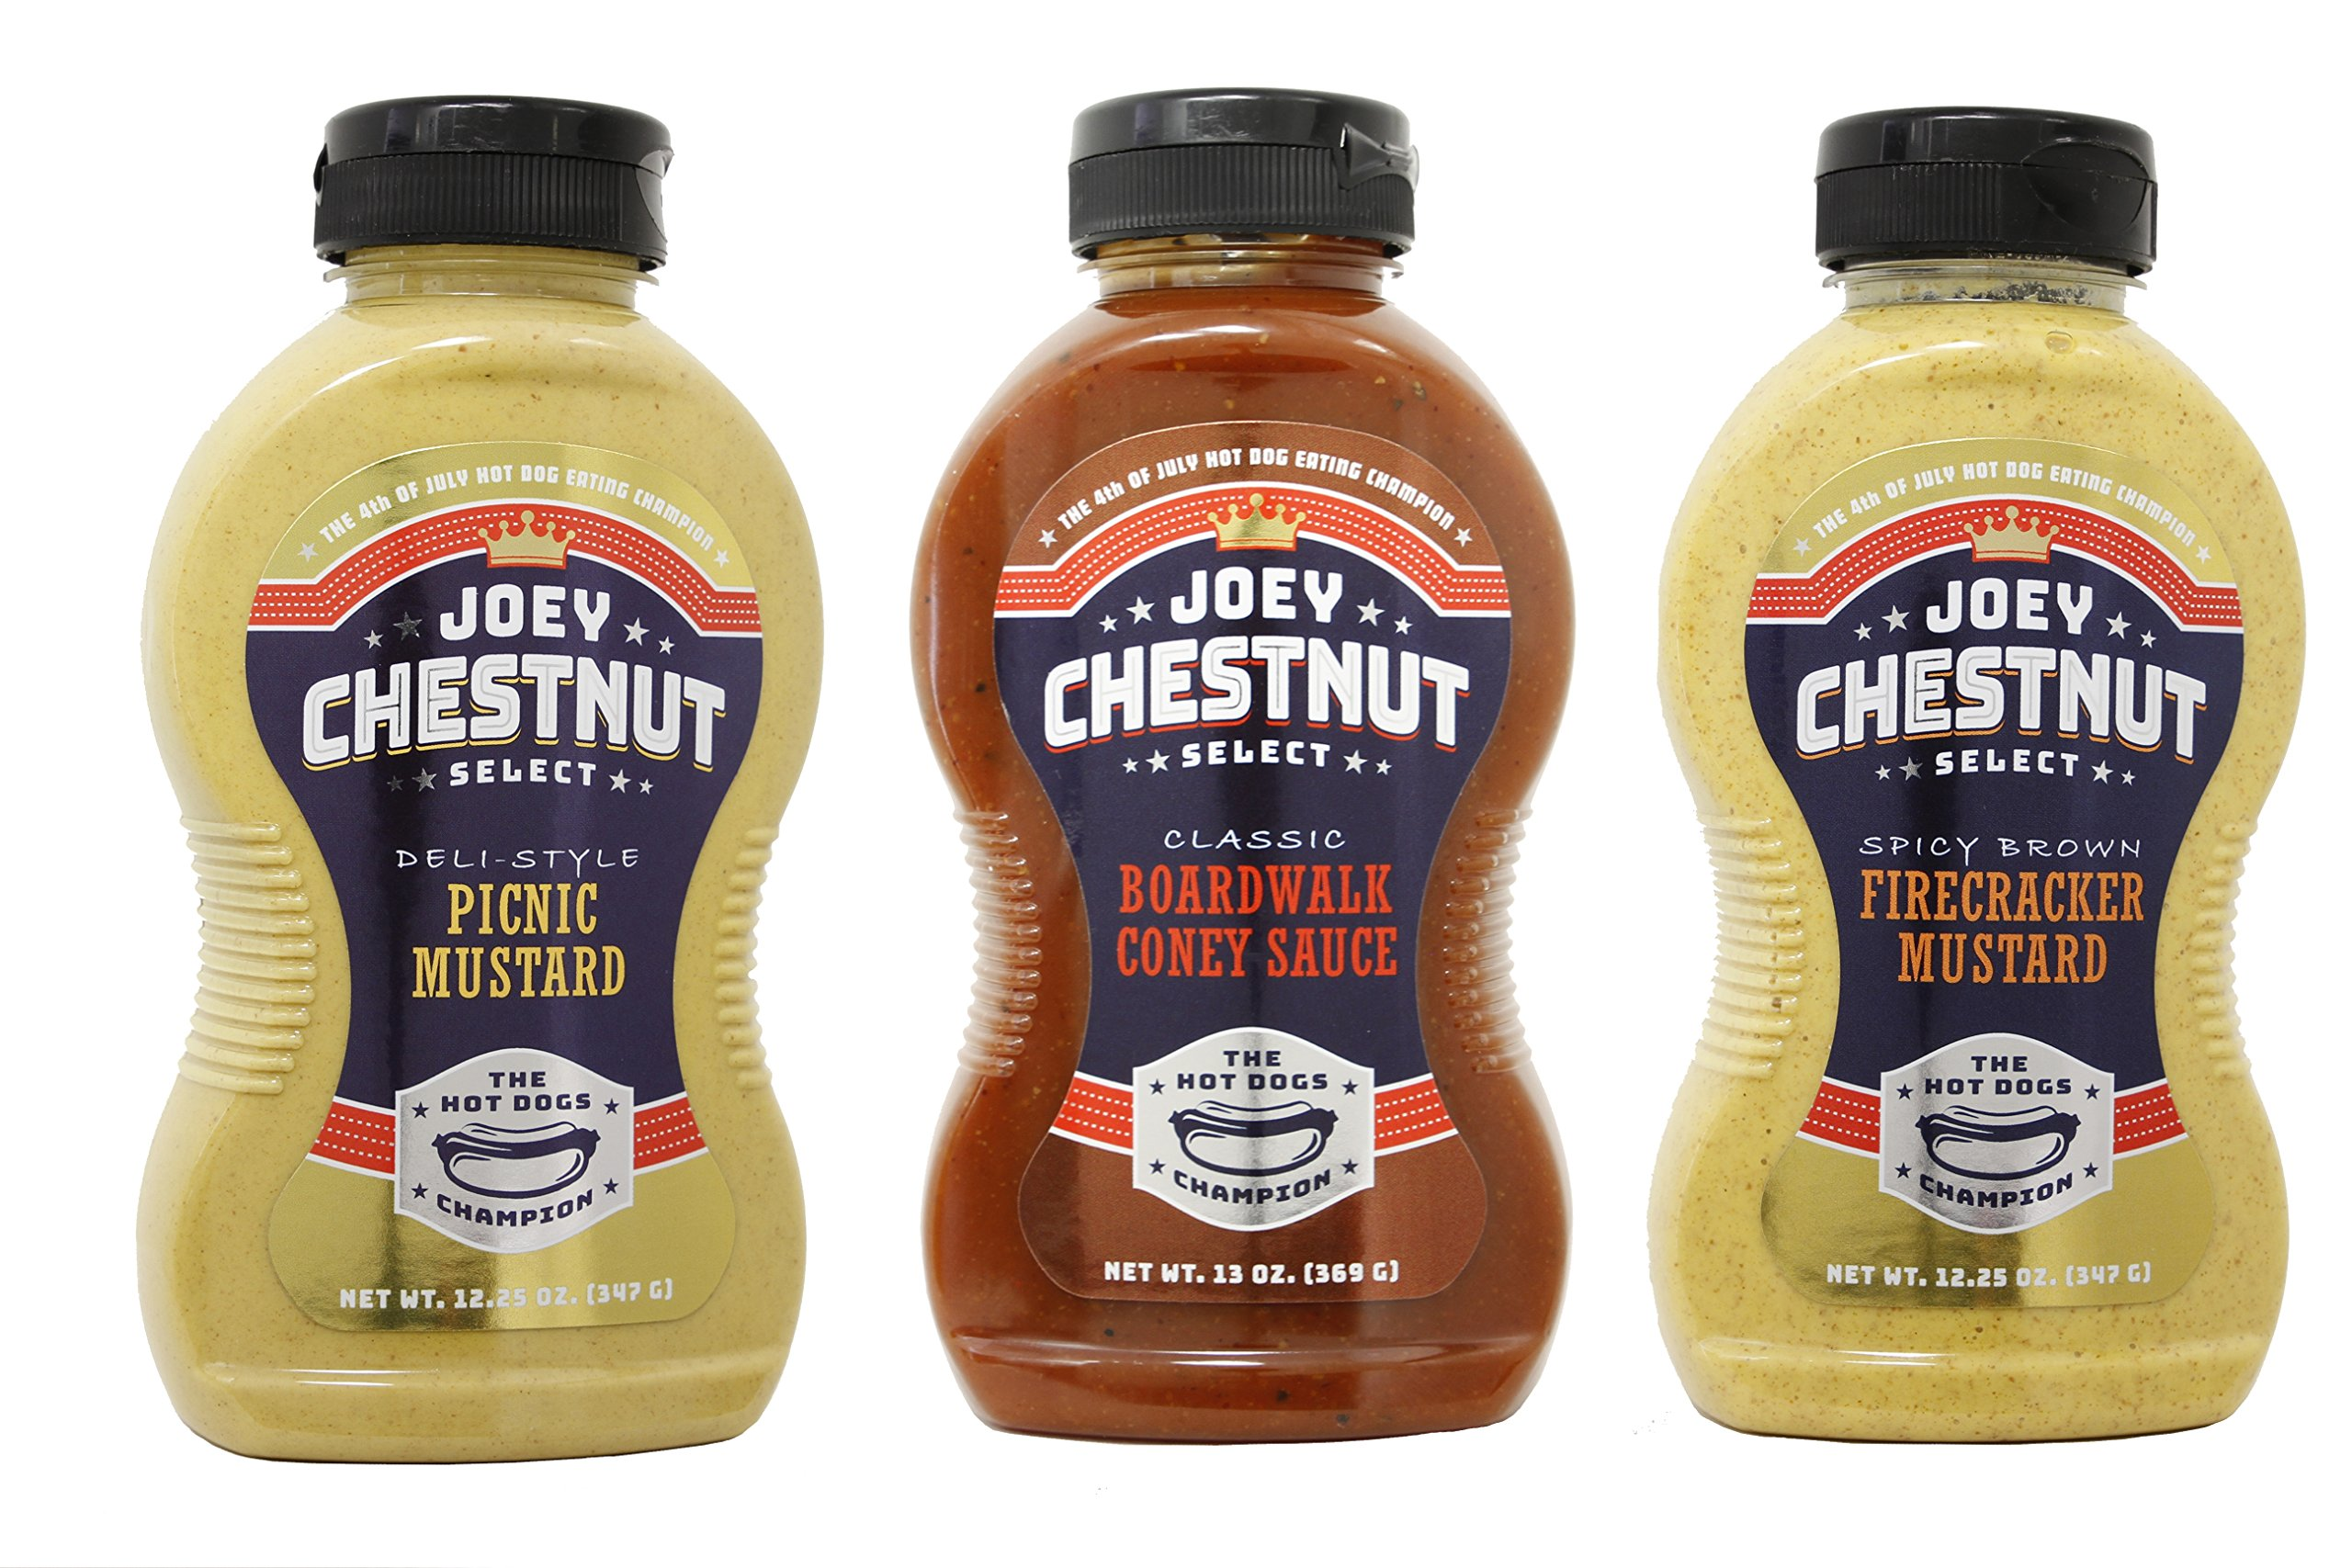 Joey Chestnut 3 Pack